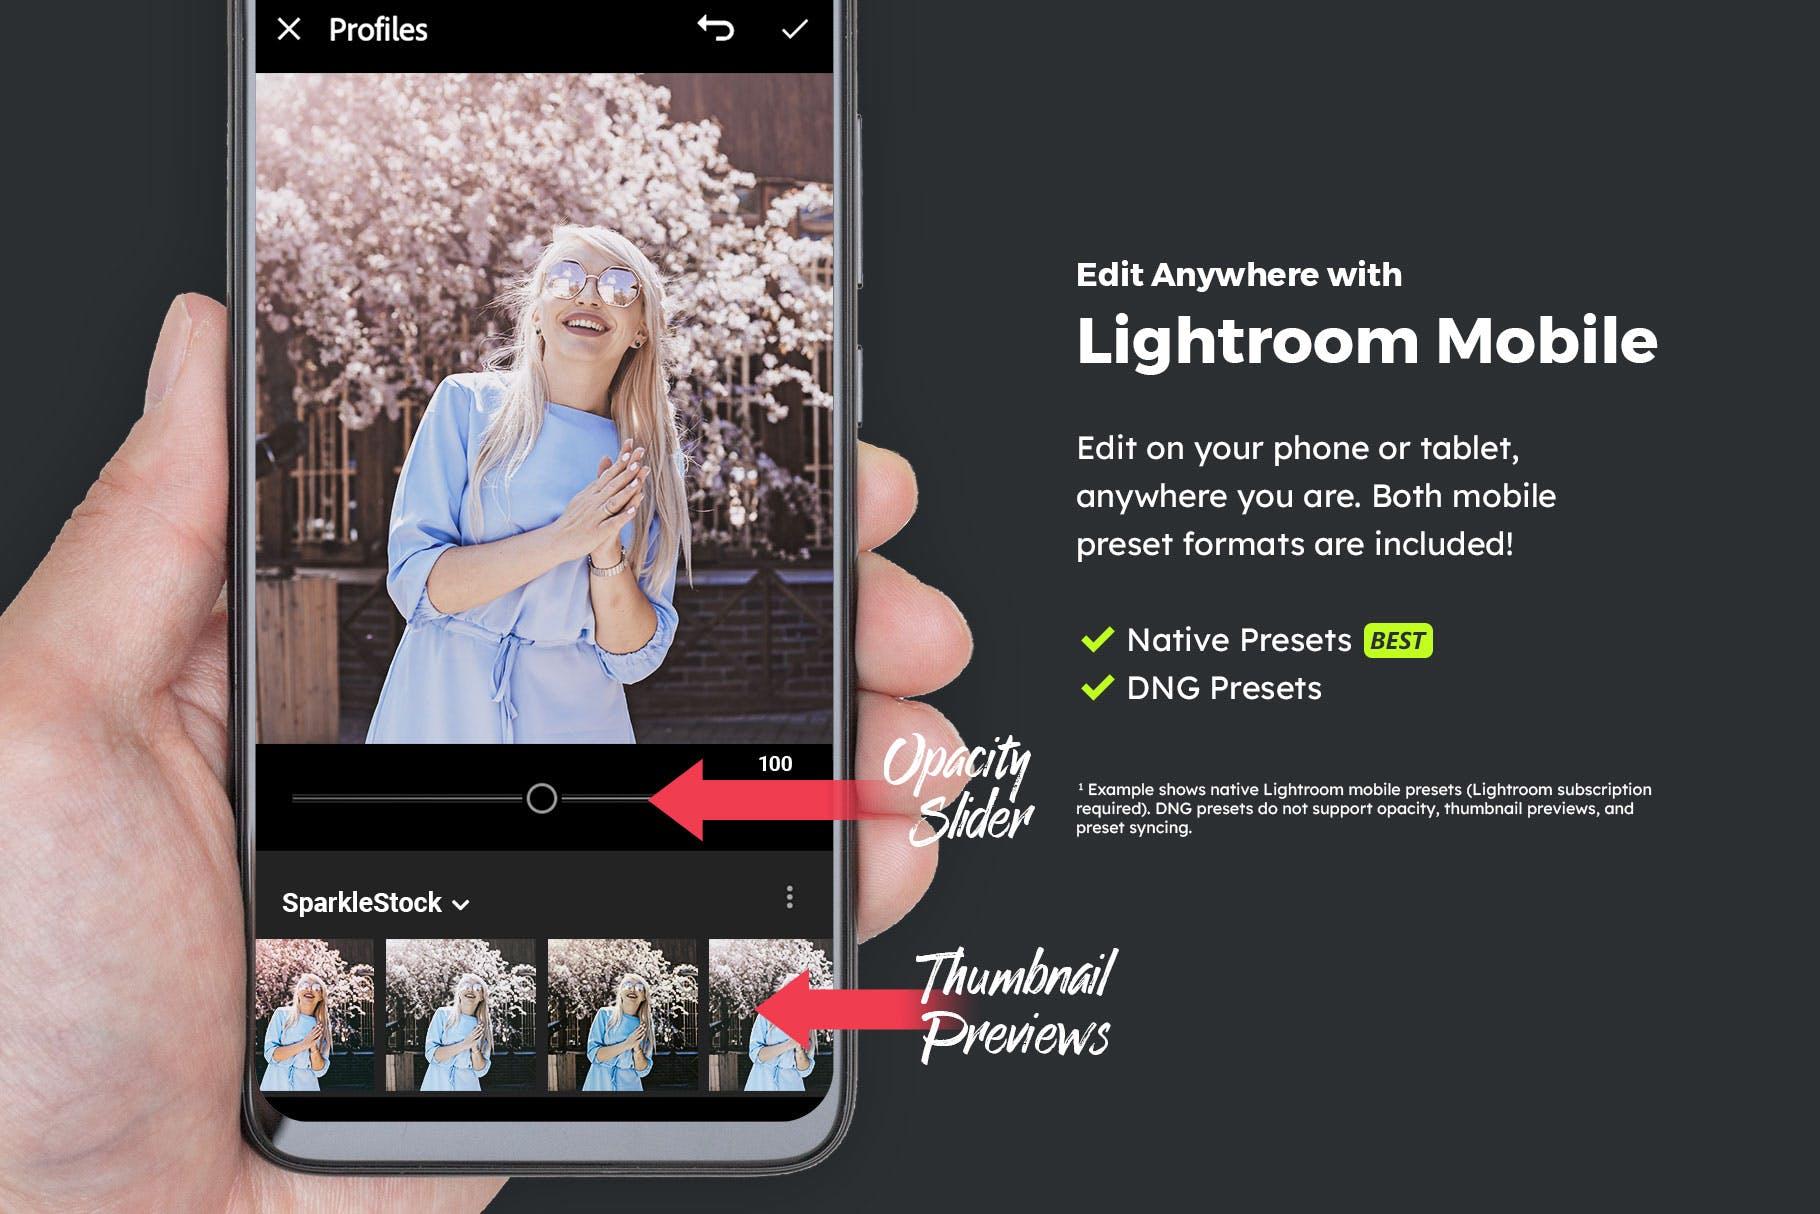 LR蓝色调色预设电影级摄影效果处理 20 Blueberry Lightroom Presets & LUTs设计素材模板